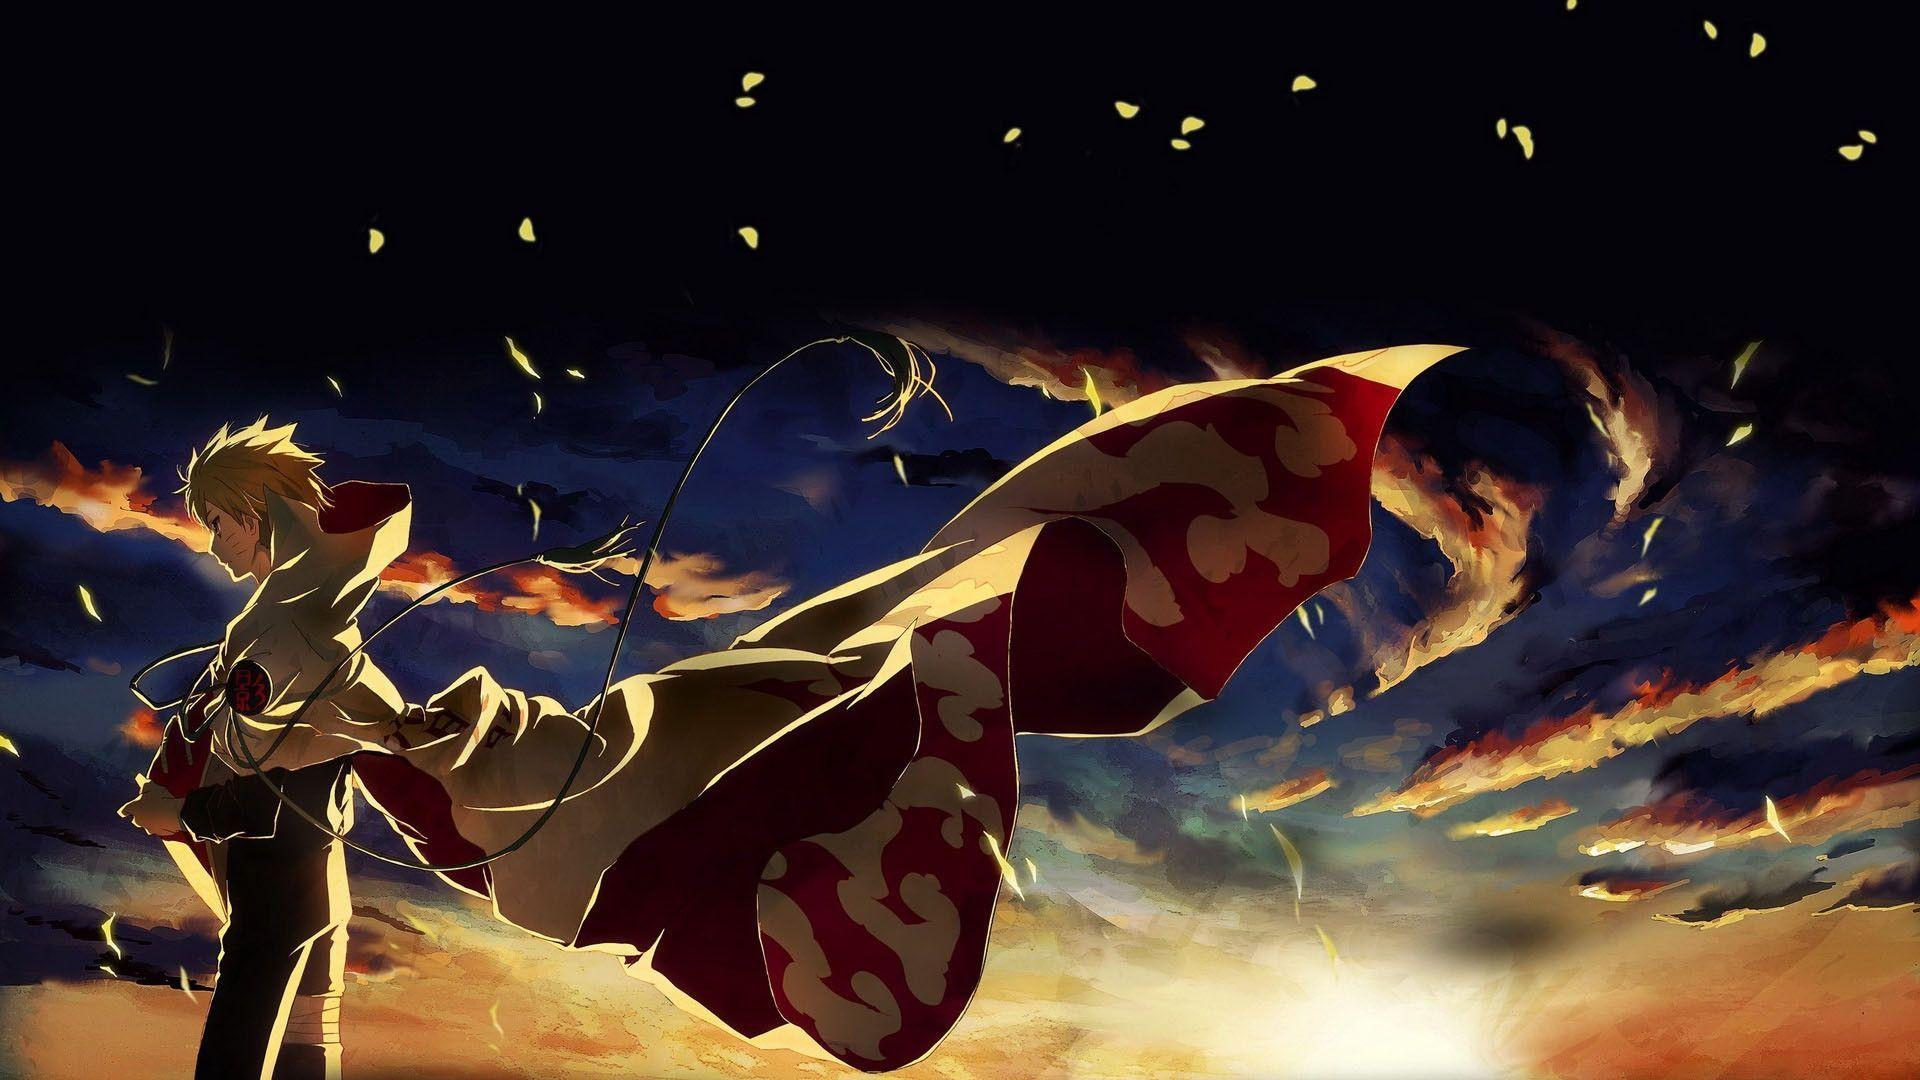 cool anime hd wallpaper 1